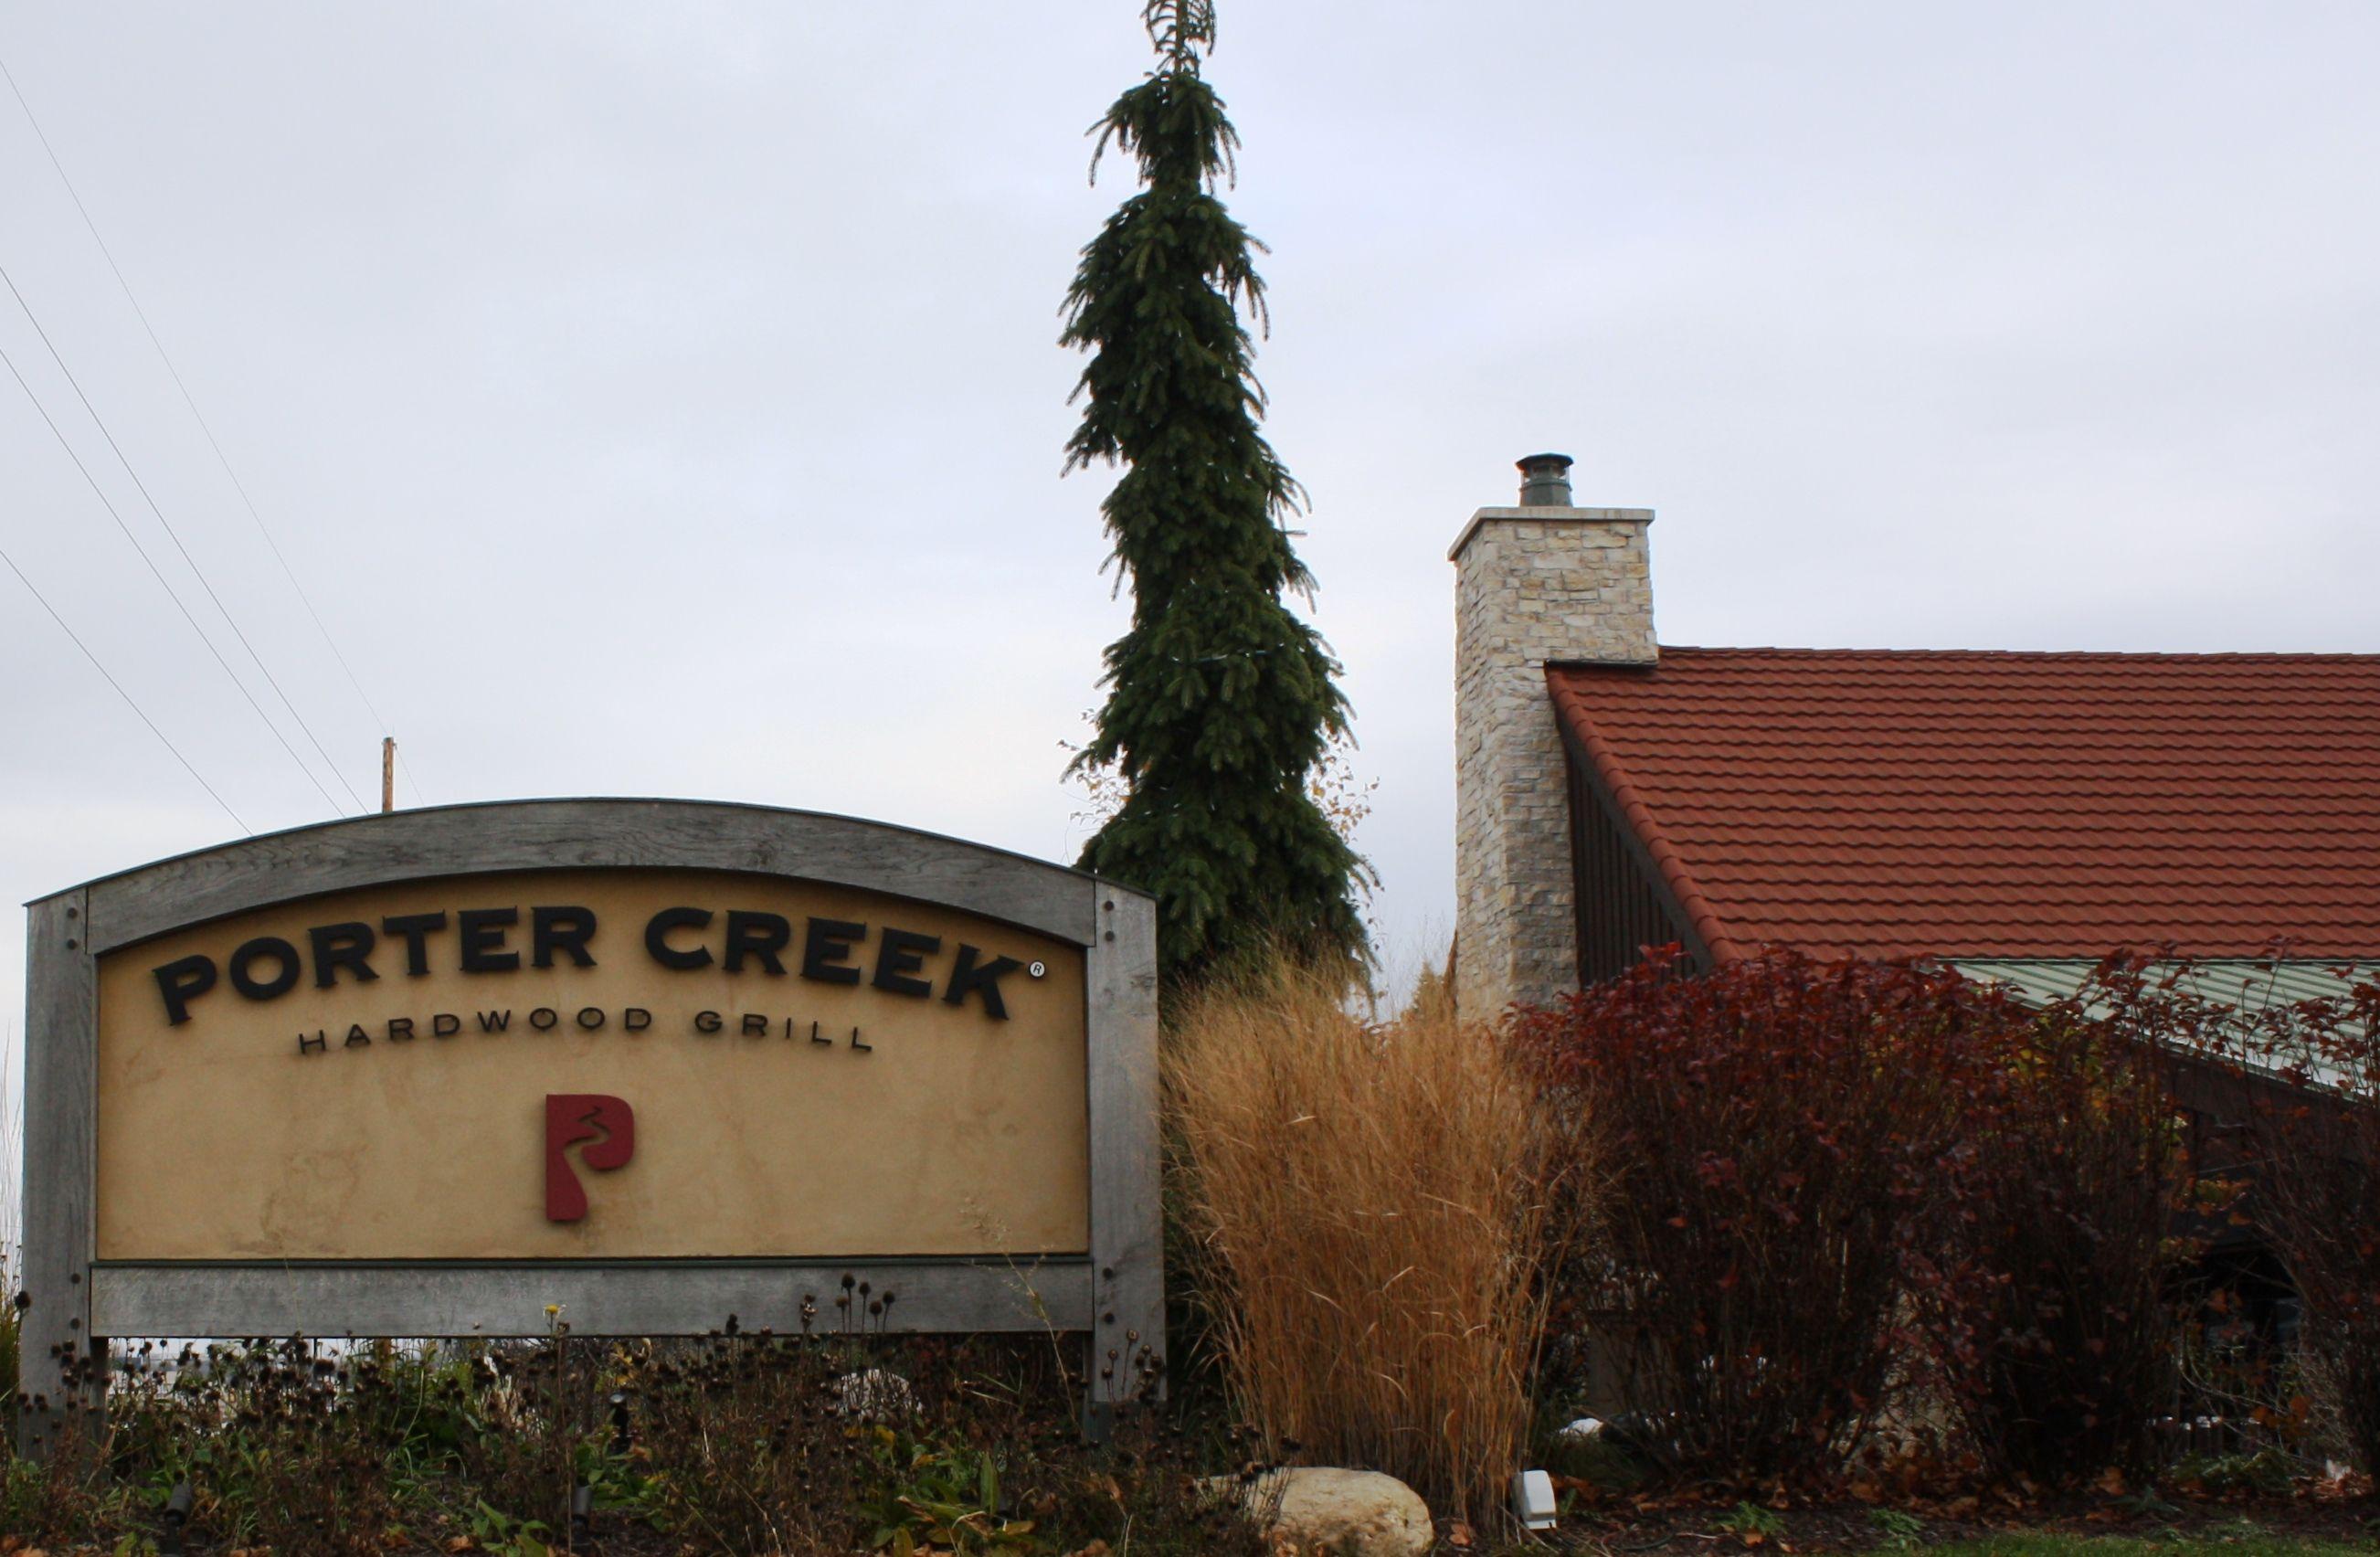 Porter Creek Hardwood Grill Burnsville, MN. Excellent food